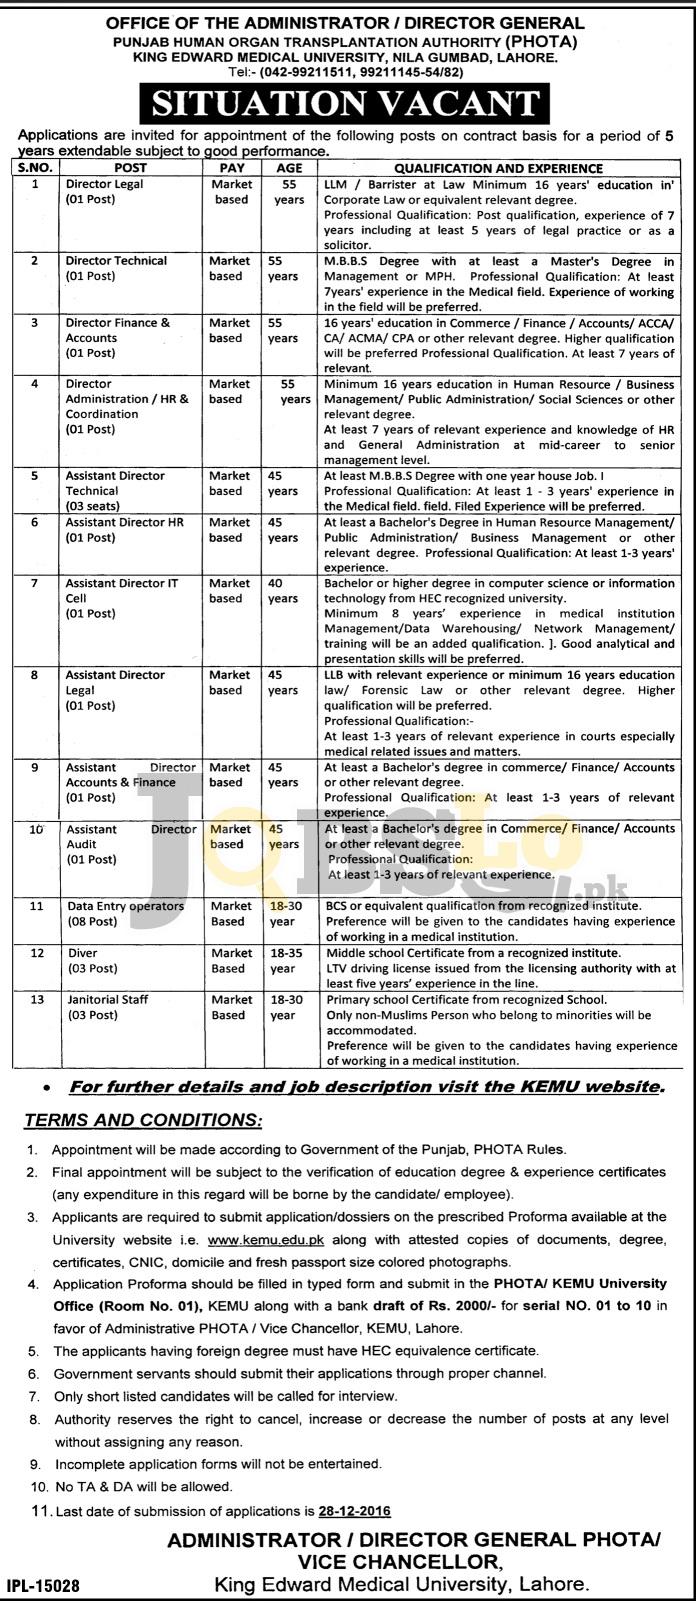 King Edward Medical University Lahore Jobs 2016-2017 Application Form Download